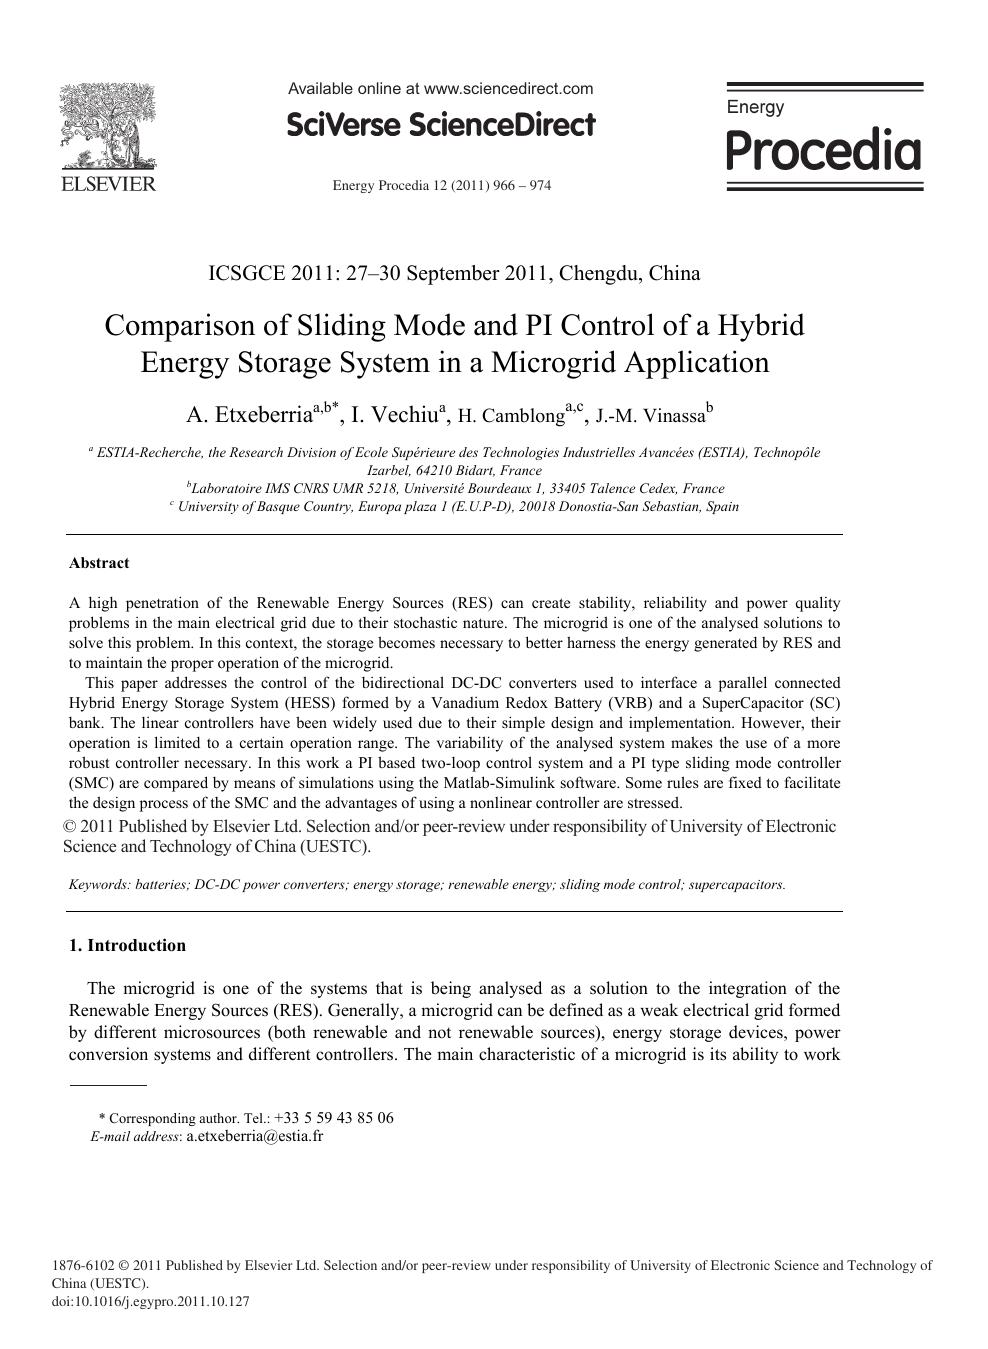 Comparison of Sliding Mode and PI Control of a Hybrid Energy